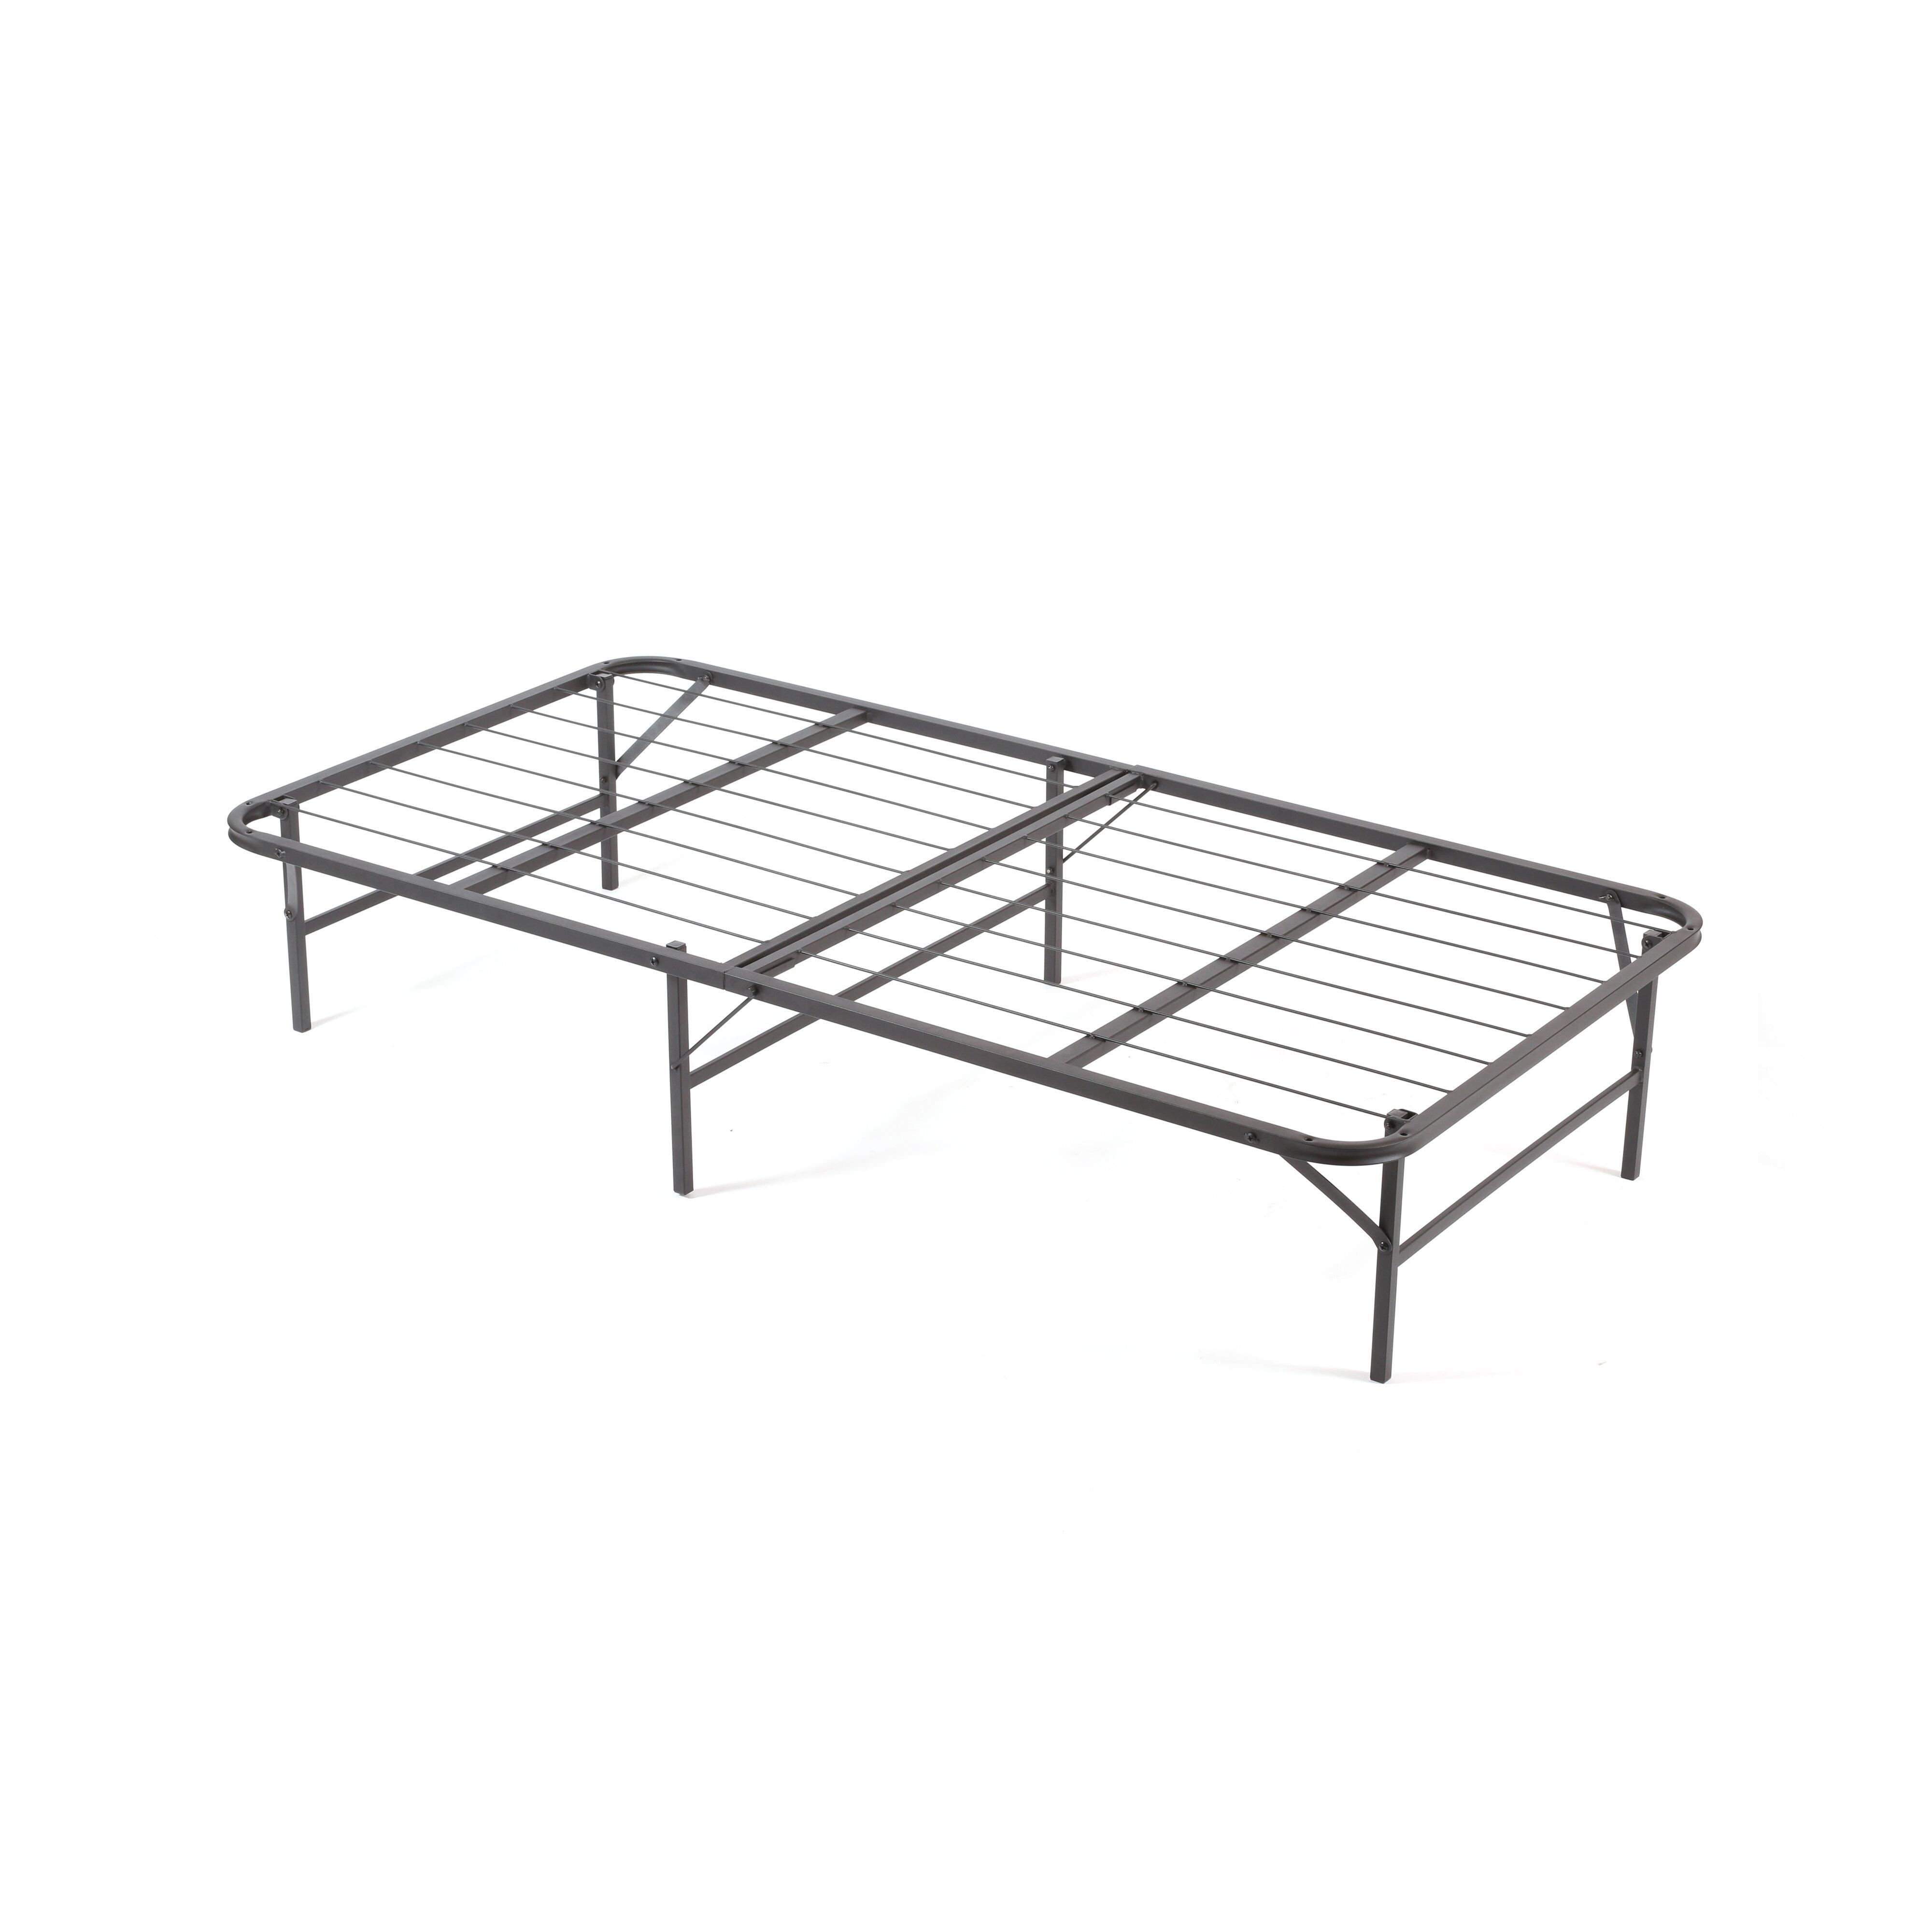 Pragma Bi Fold Bed Frame Queen